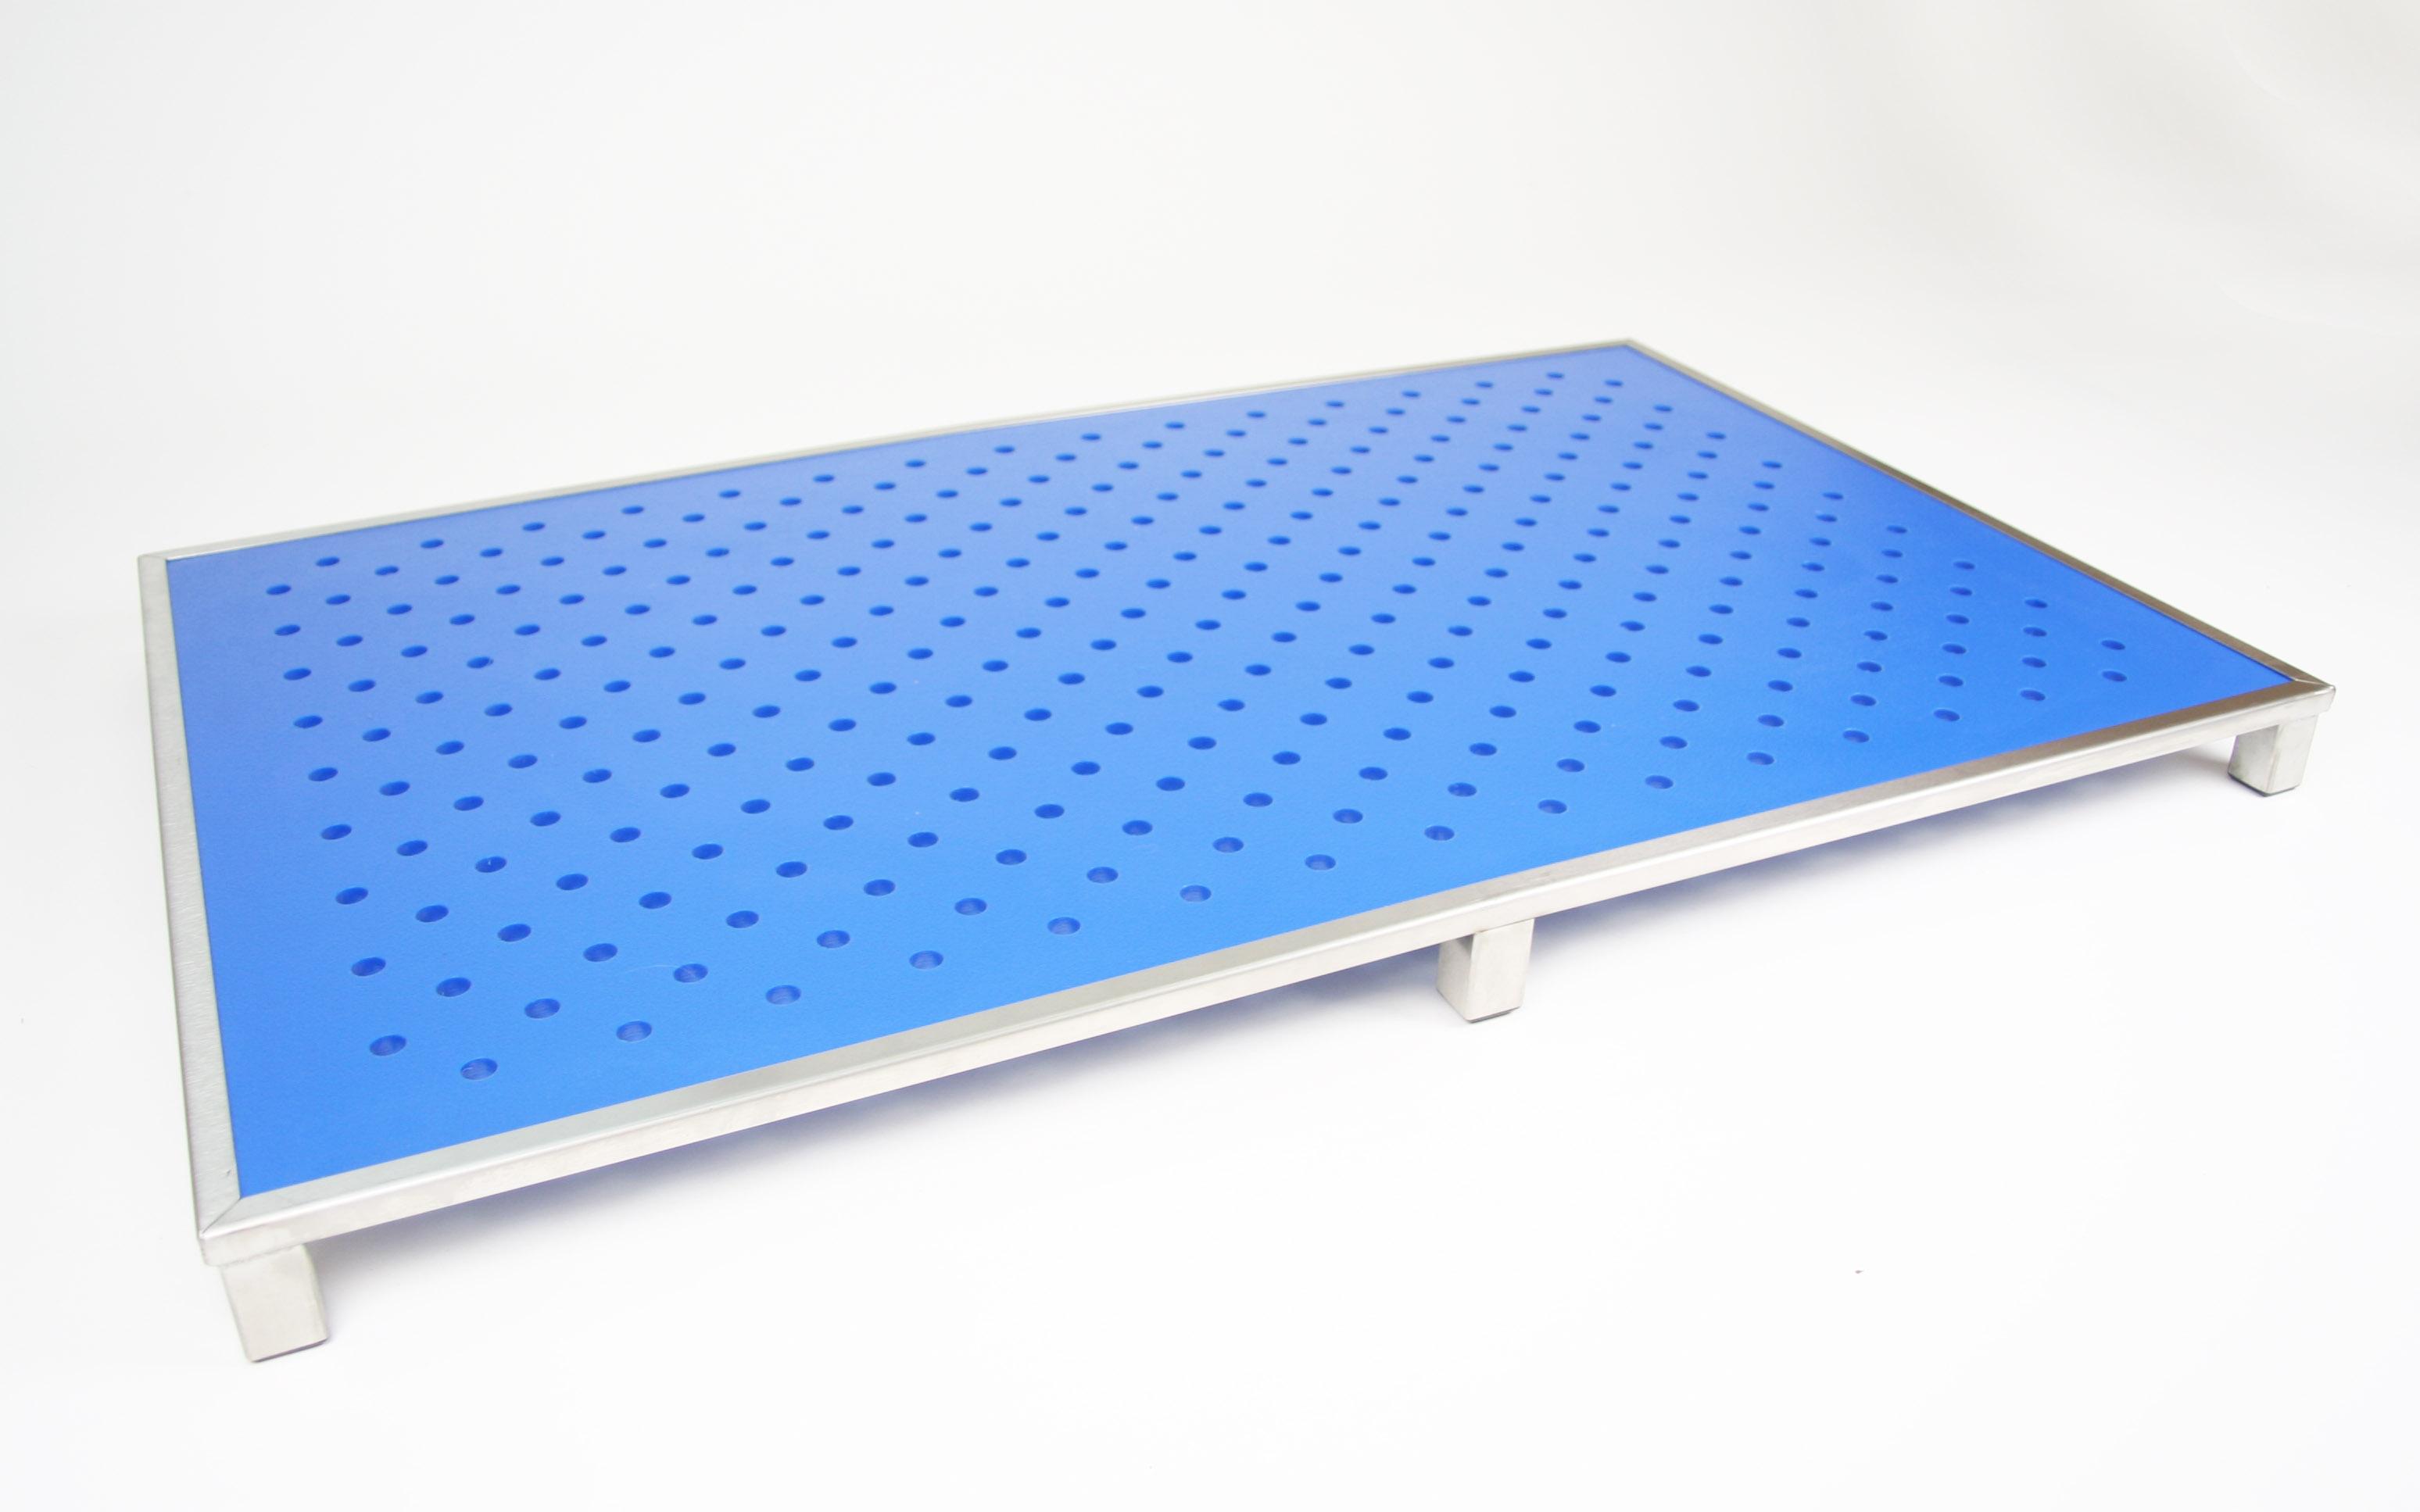 100 Kennel Floor Plans About Us Kenneldesignusa Com